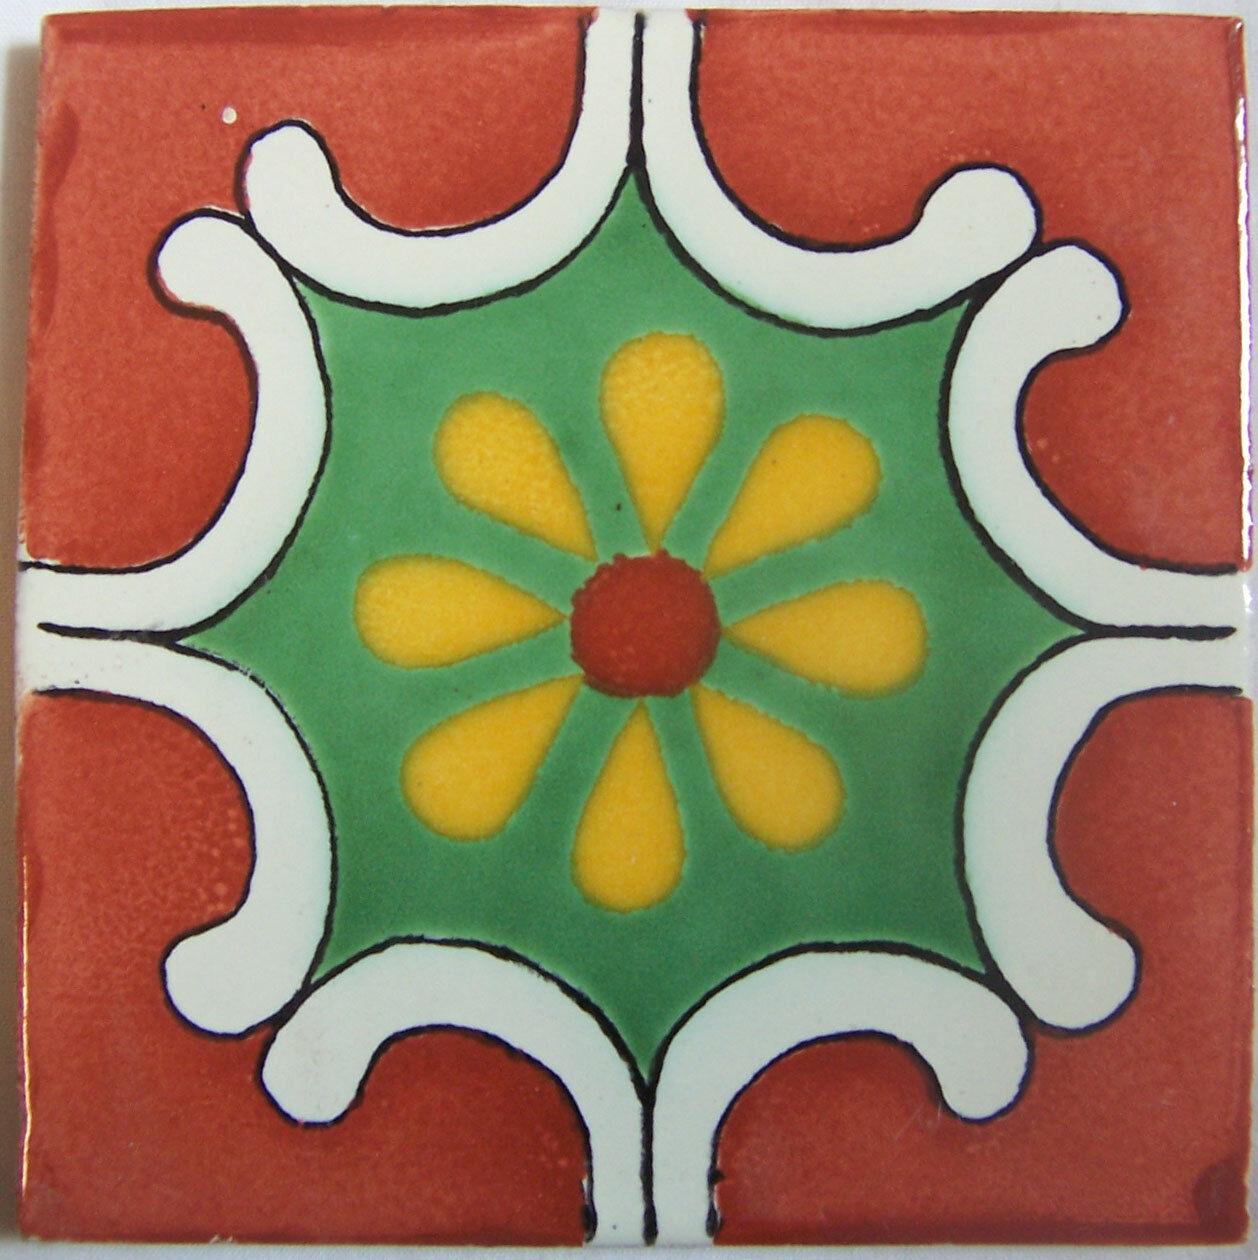 C297 - Mexican Handmade Talavera Clay Tile Folk Art 4x4